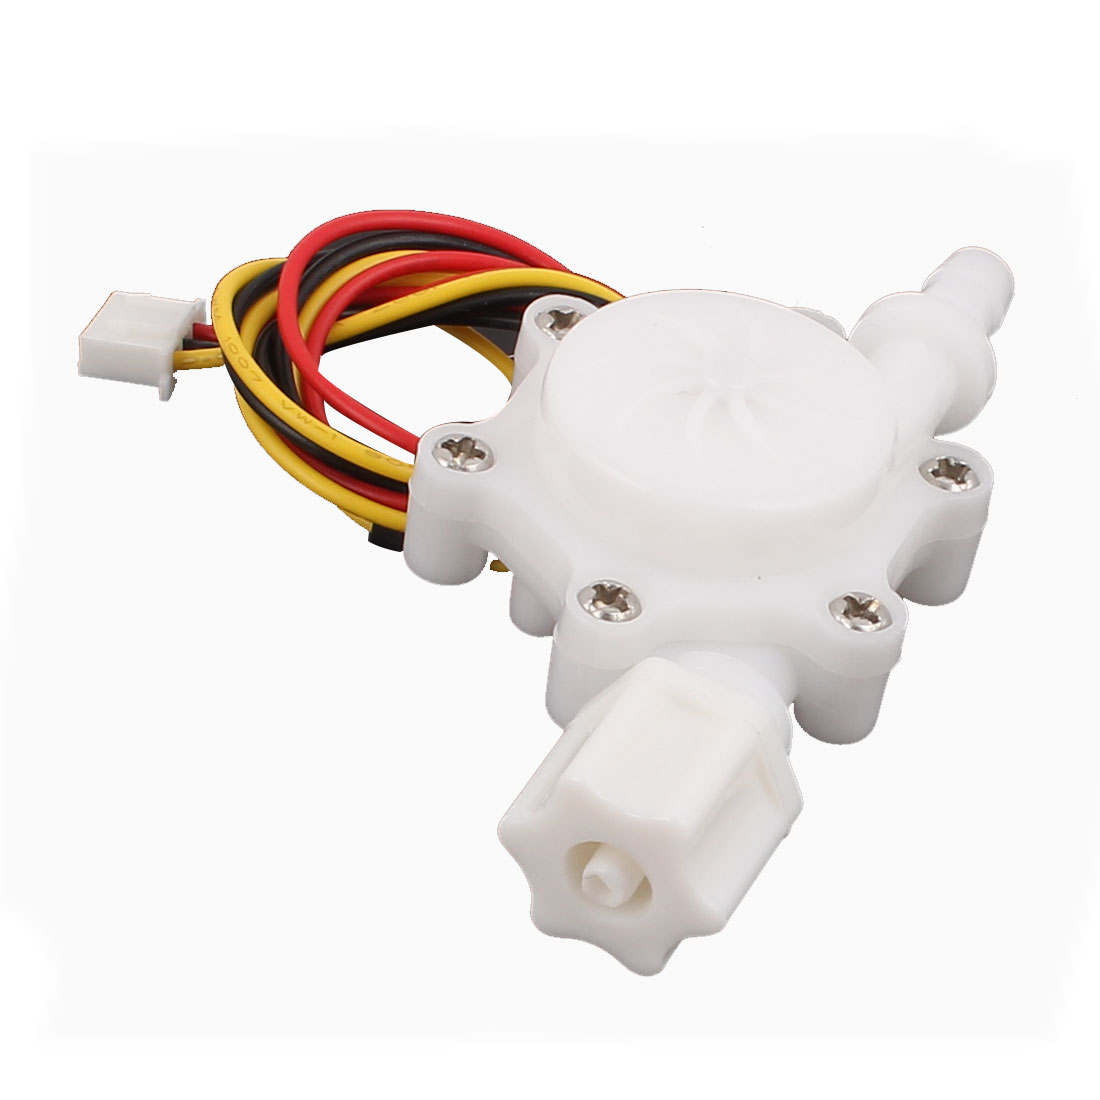 G1/4 Male Thread 6mm Outlet Outer Dia Water Flow Sensor 0.15-1.5L/min SEN-HZ06FB